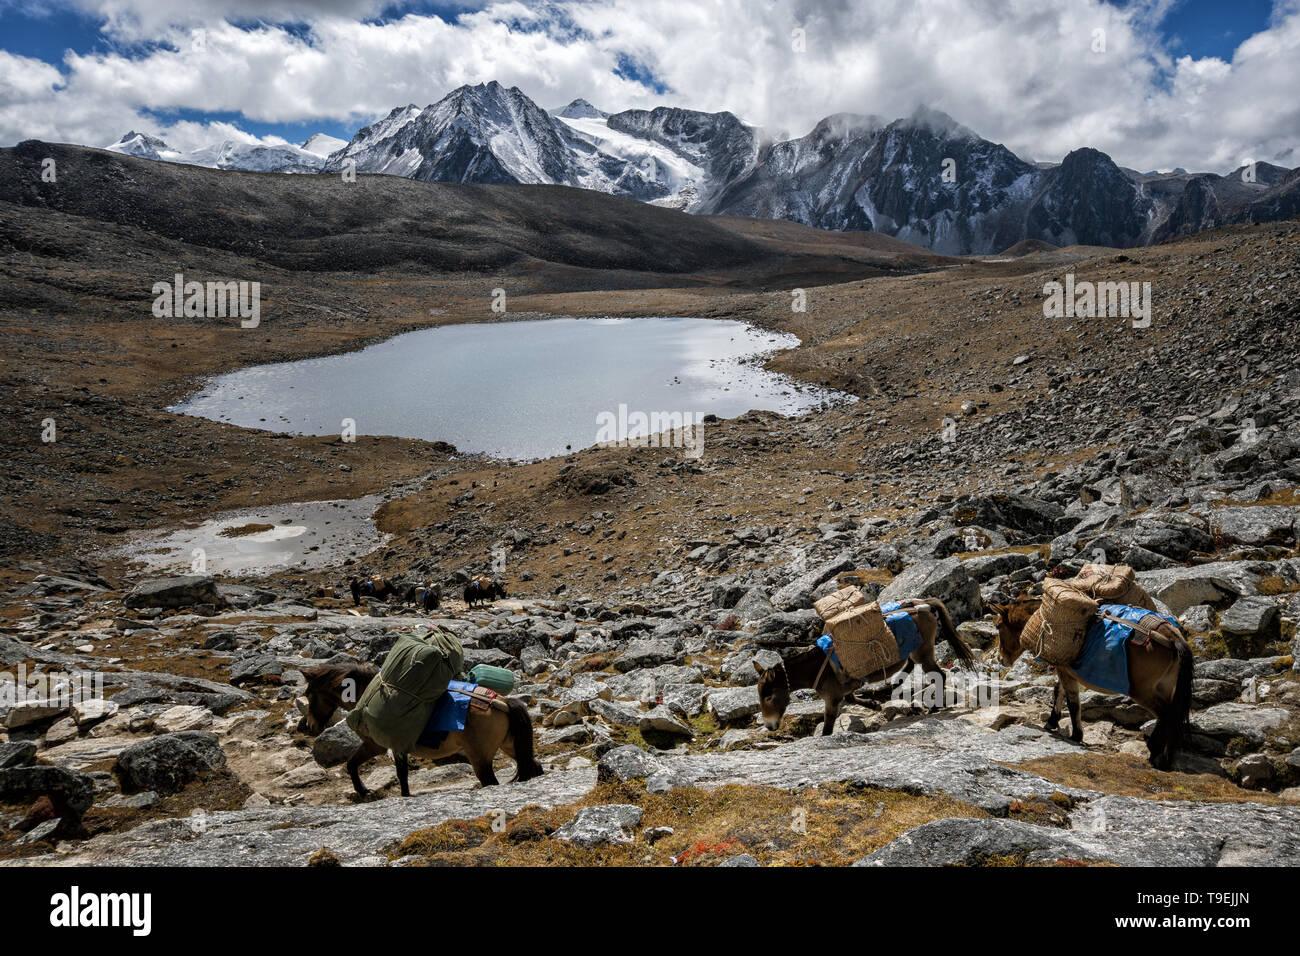 Pack animals crossing Loju La pass, Lunana Gewog, Gasa District, Snowman Trek, Bhutan Stock Photo